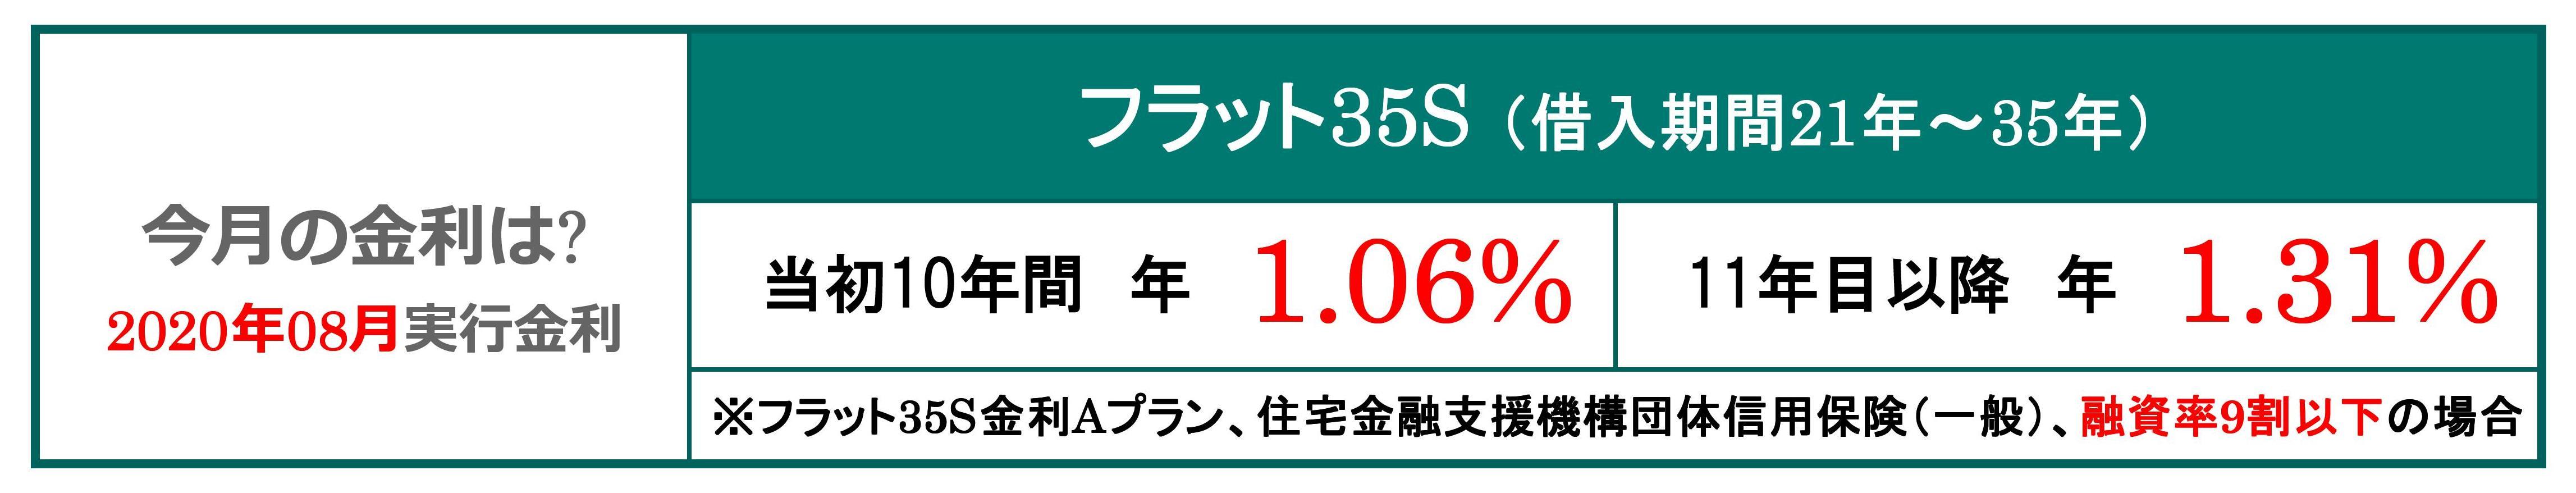 20200801kinri%20%281%29.jpg